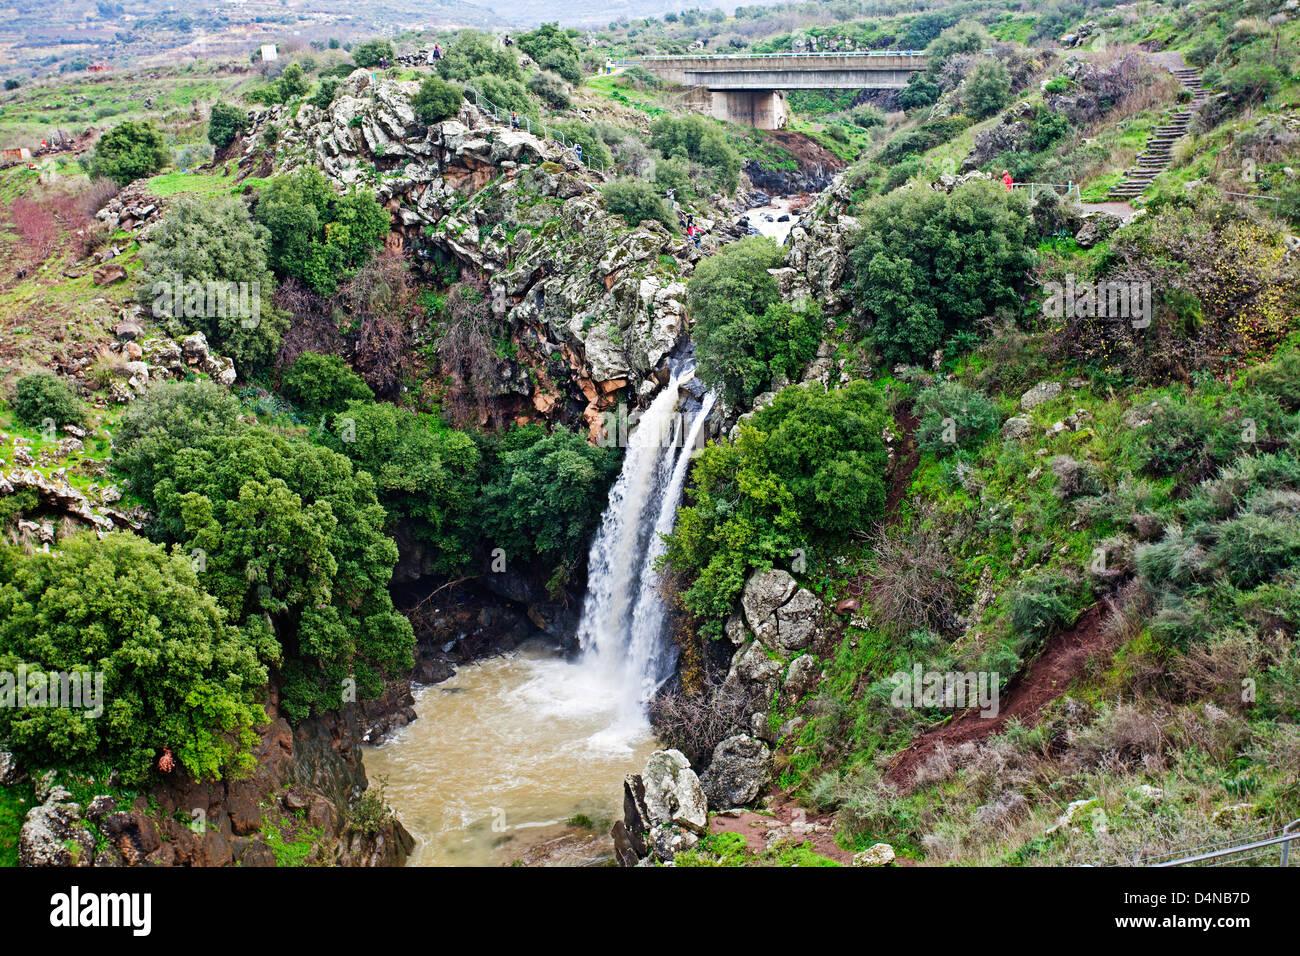 Israele, Golan, Saar con cascata riserva naturale Immagini Stock